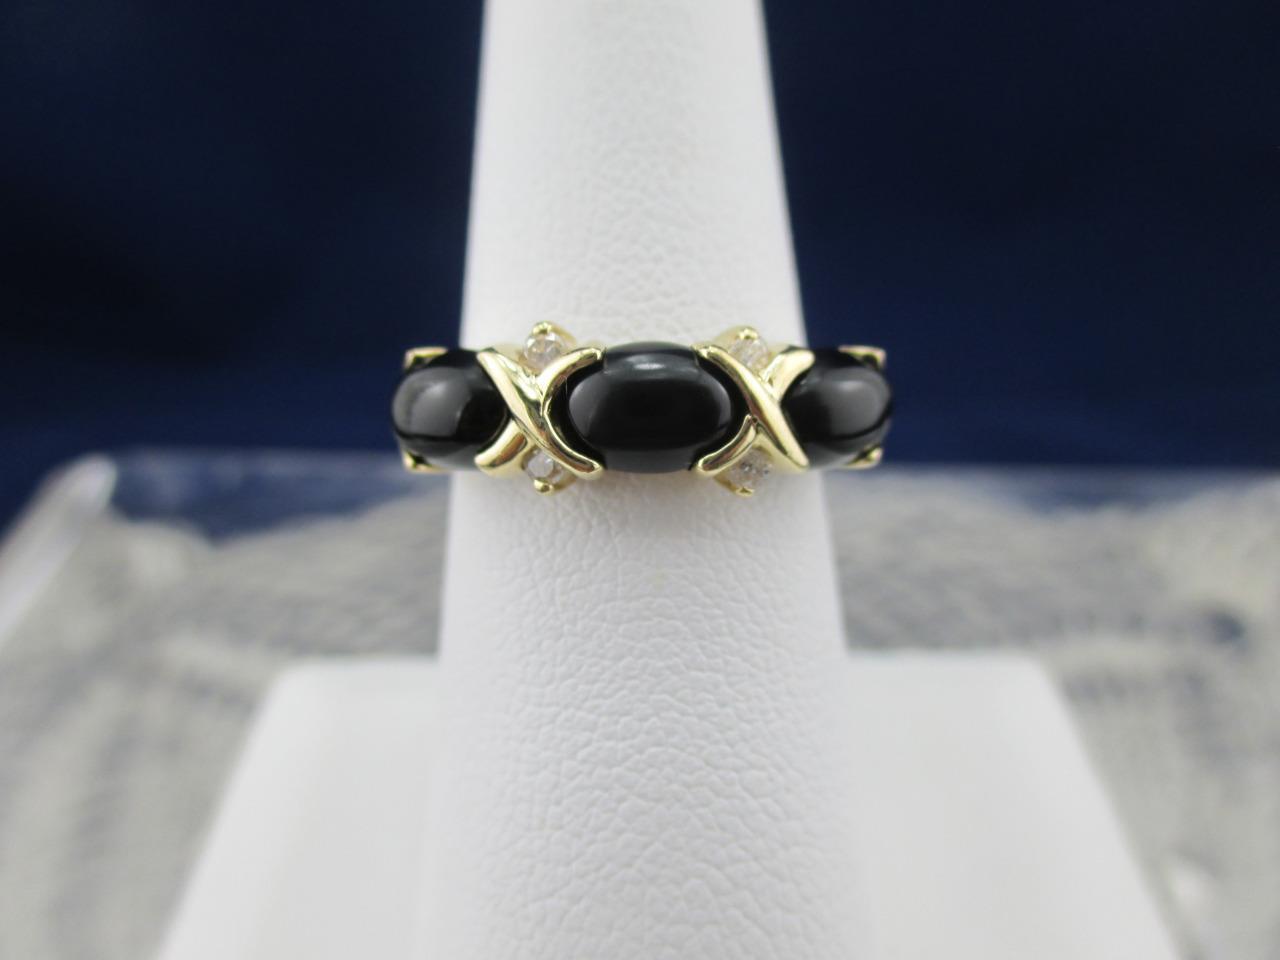 Retro Vintage Onyx XOXO Ladies Ring14k gold Accent DiamondsHugs Kisses